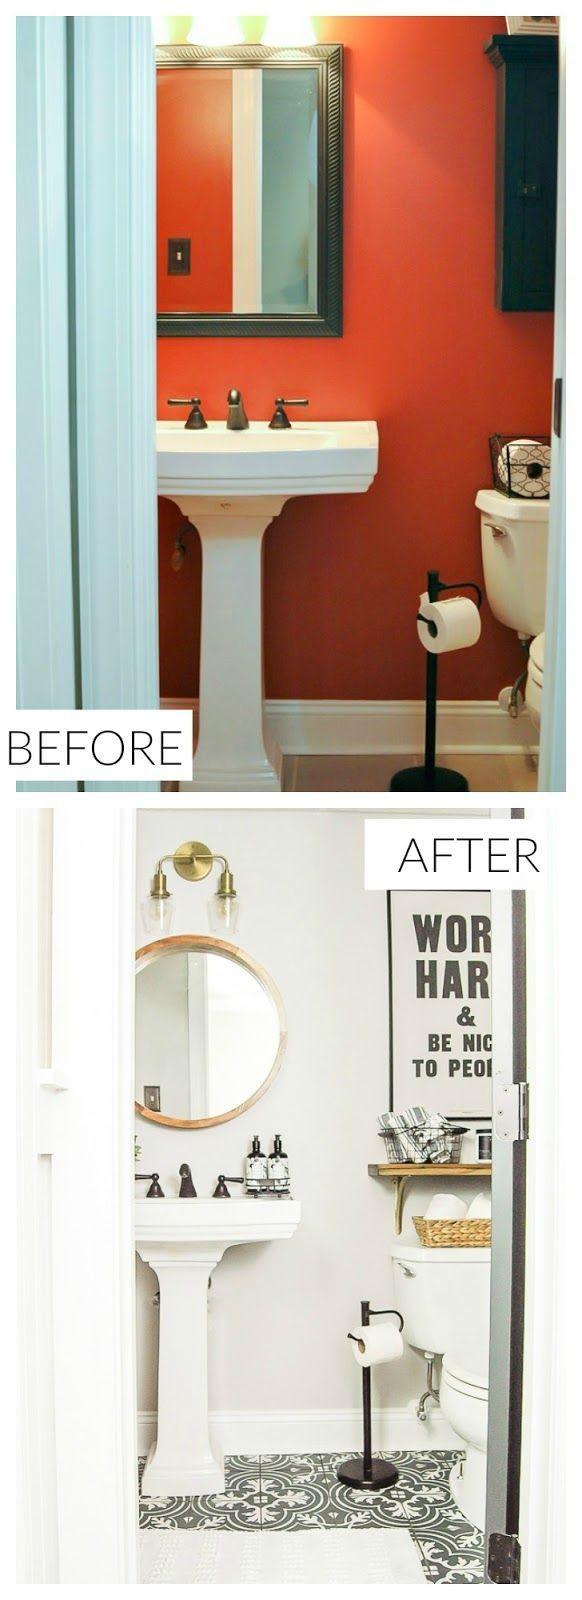 diy shelf ideas for bathroom%0A One Room Challenge Reveal  Gray and White Vintage Modern Bathroom